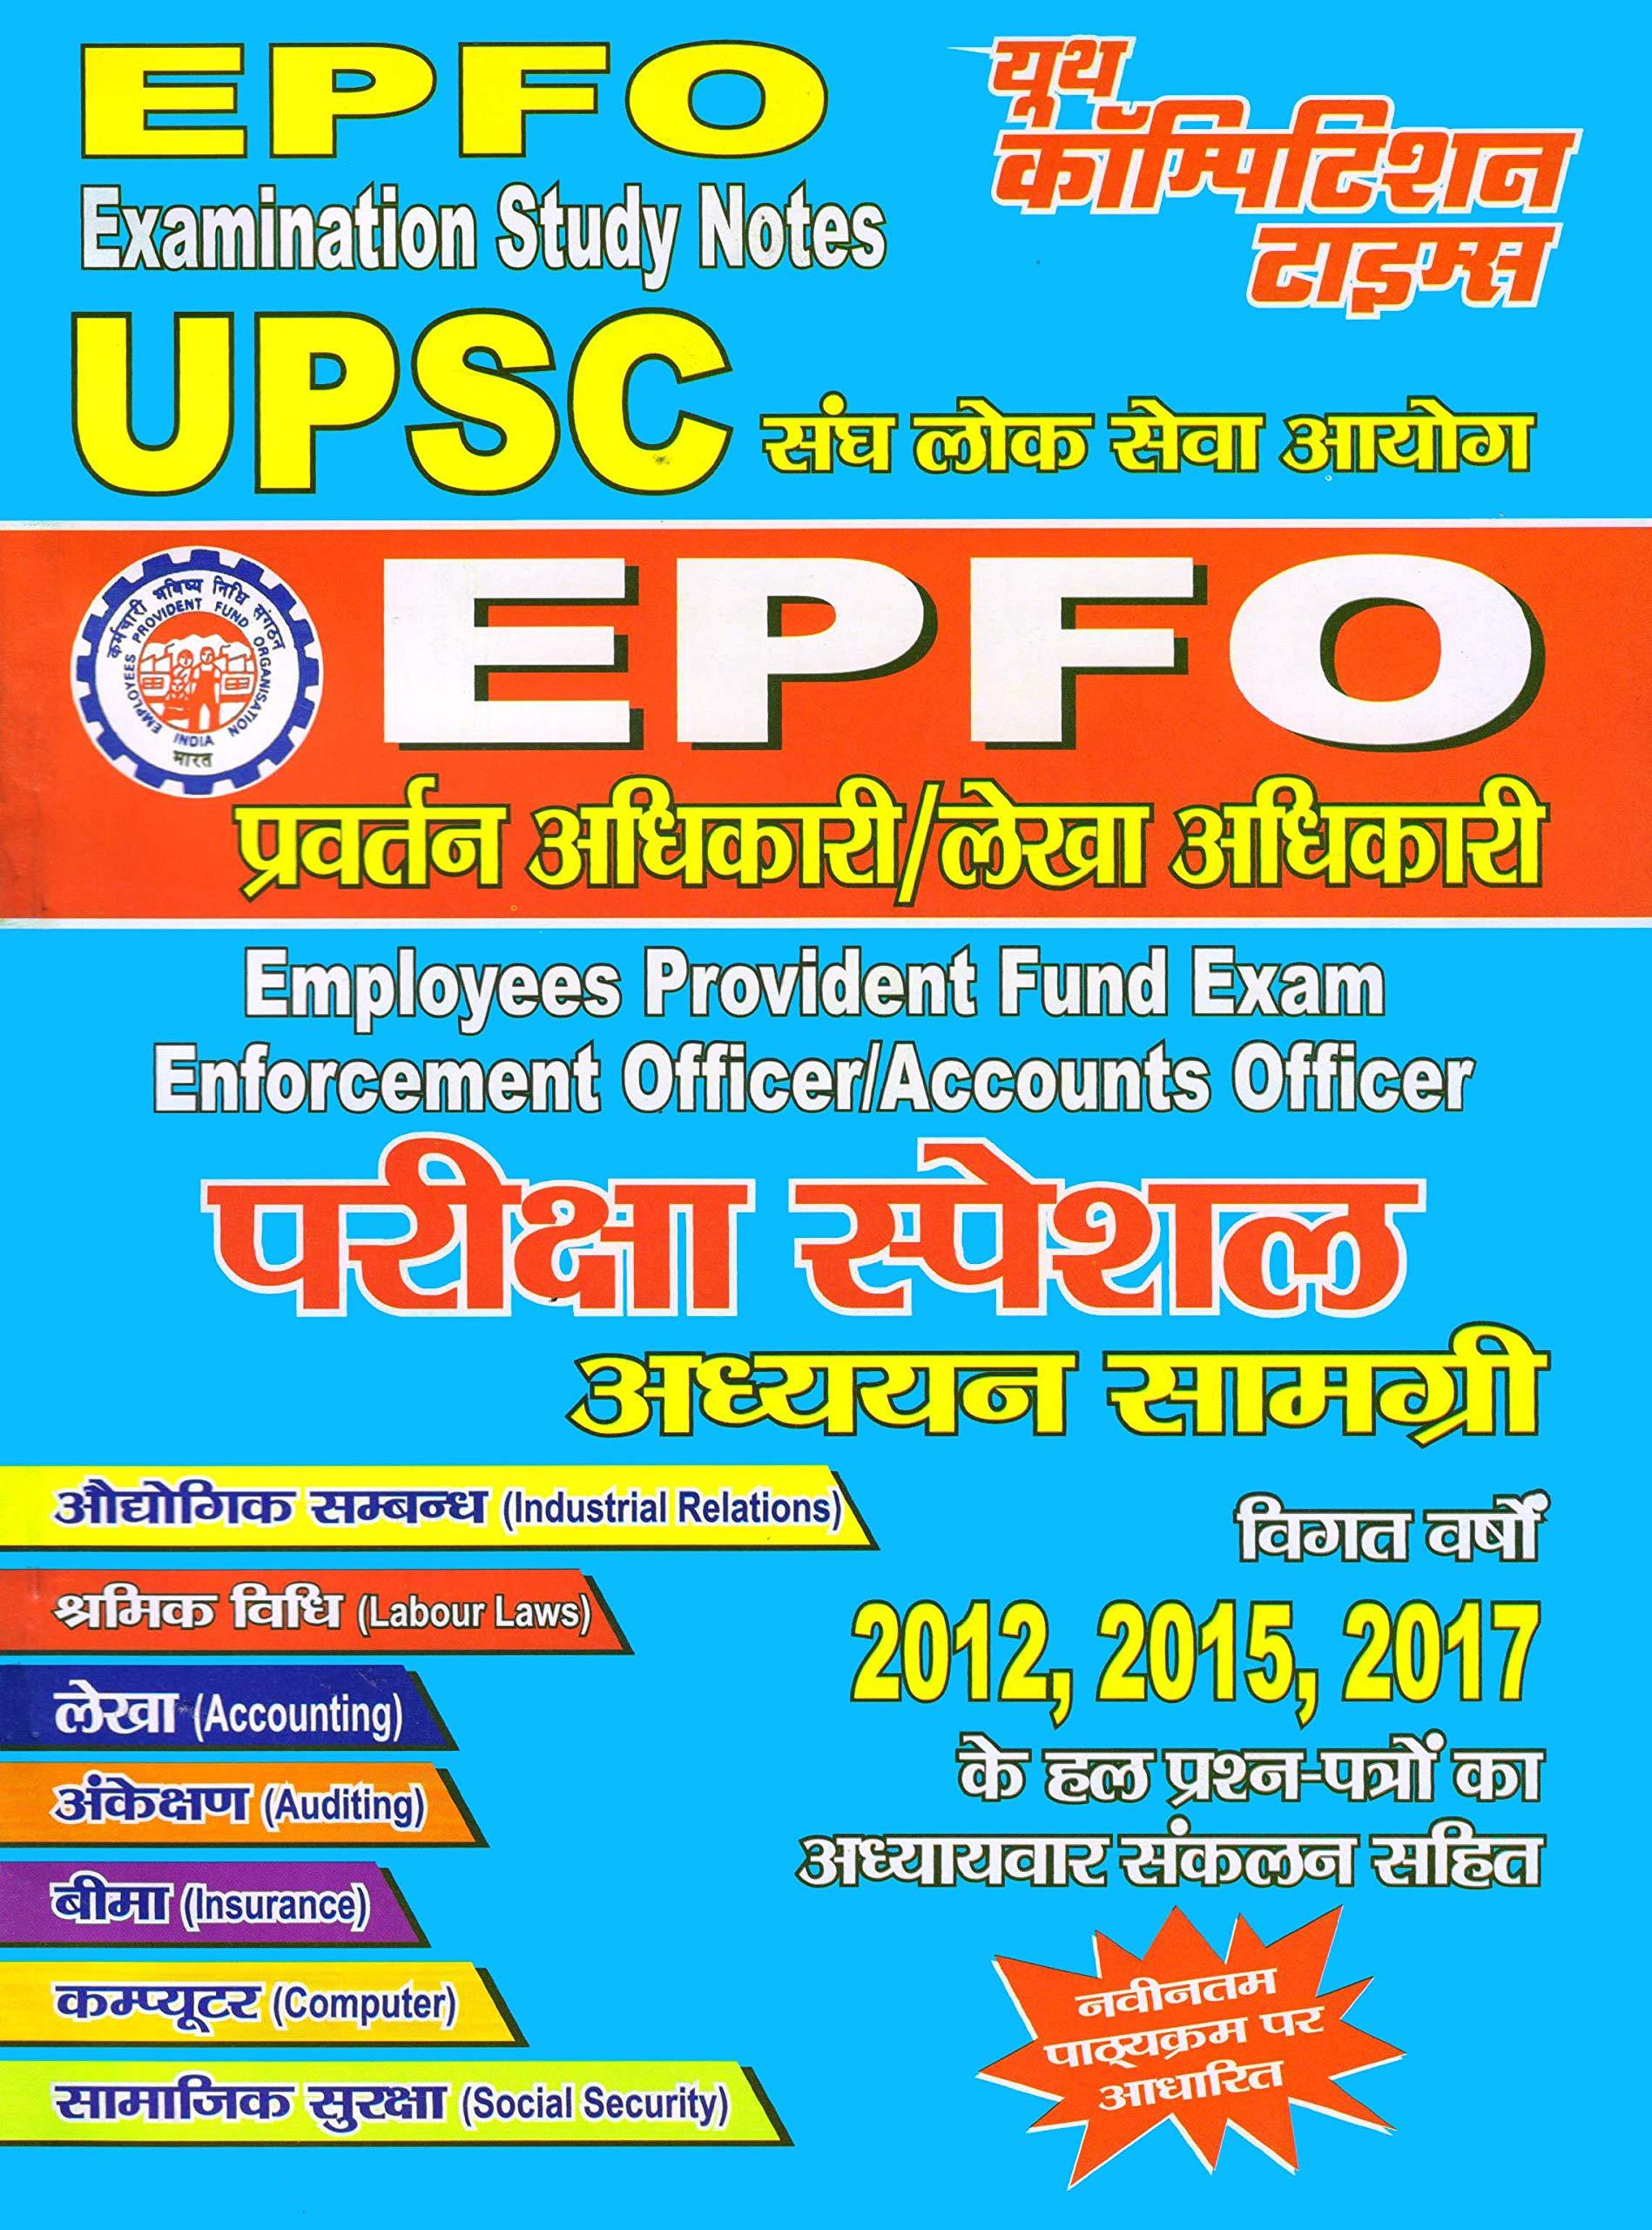 STUDY MATERIAL (UPSC EPFO): UPSC EPFO SPECIAL EXAM (20200227 Book 614)